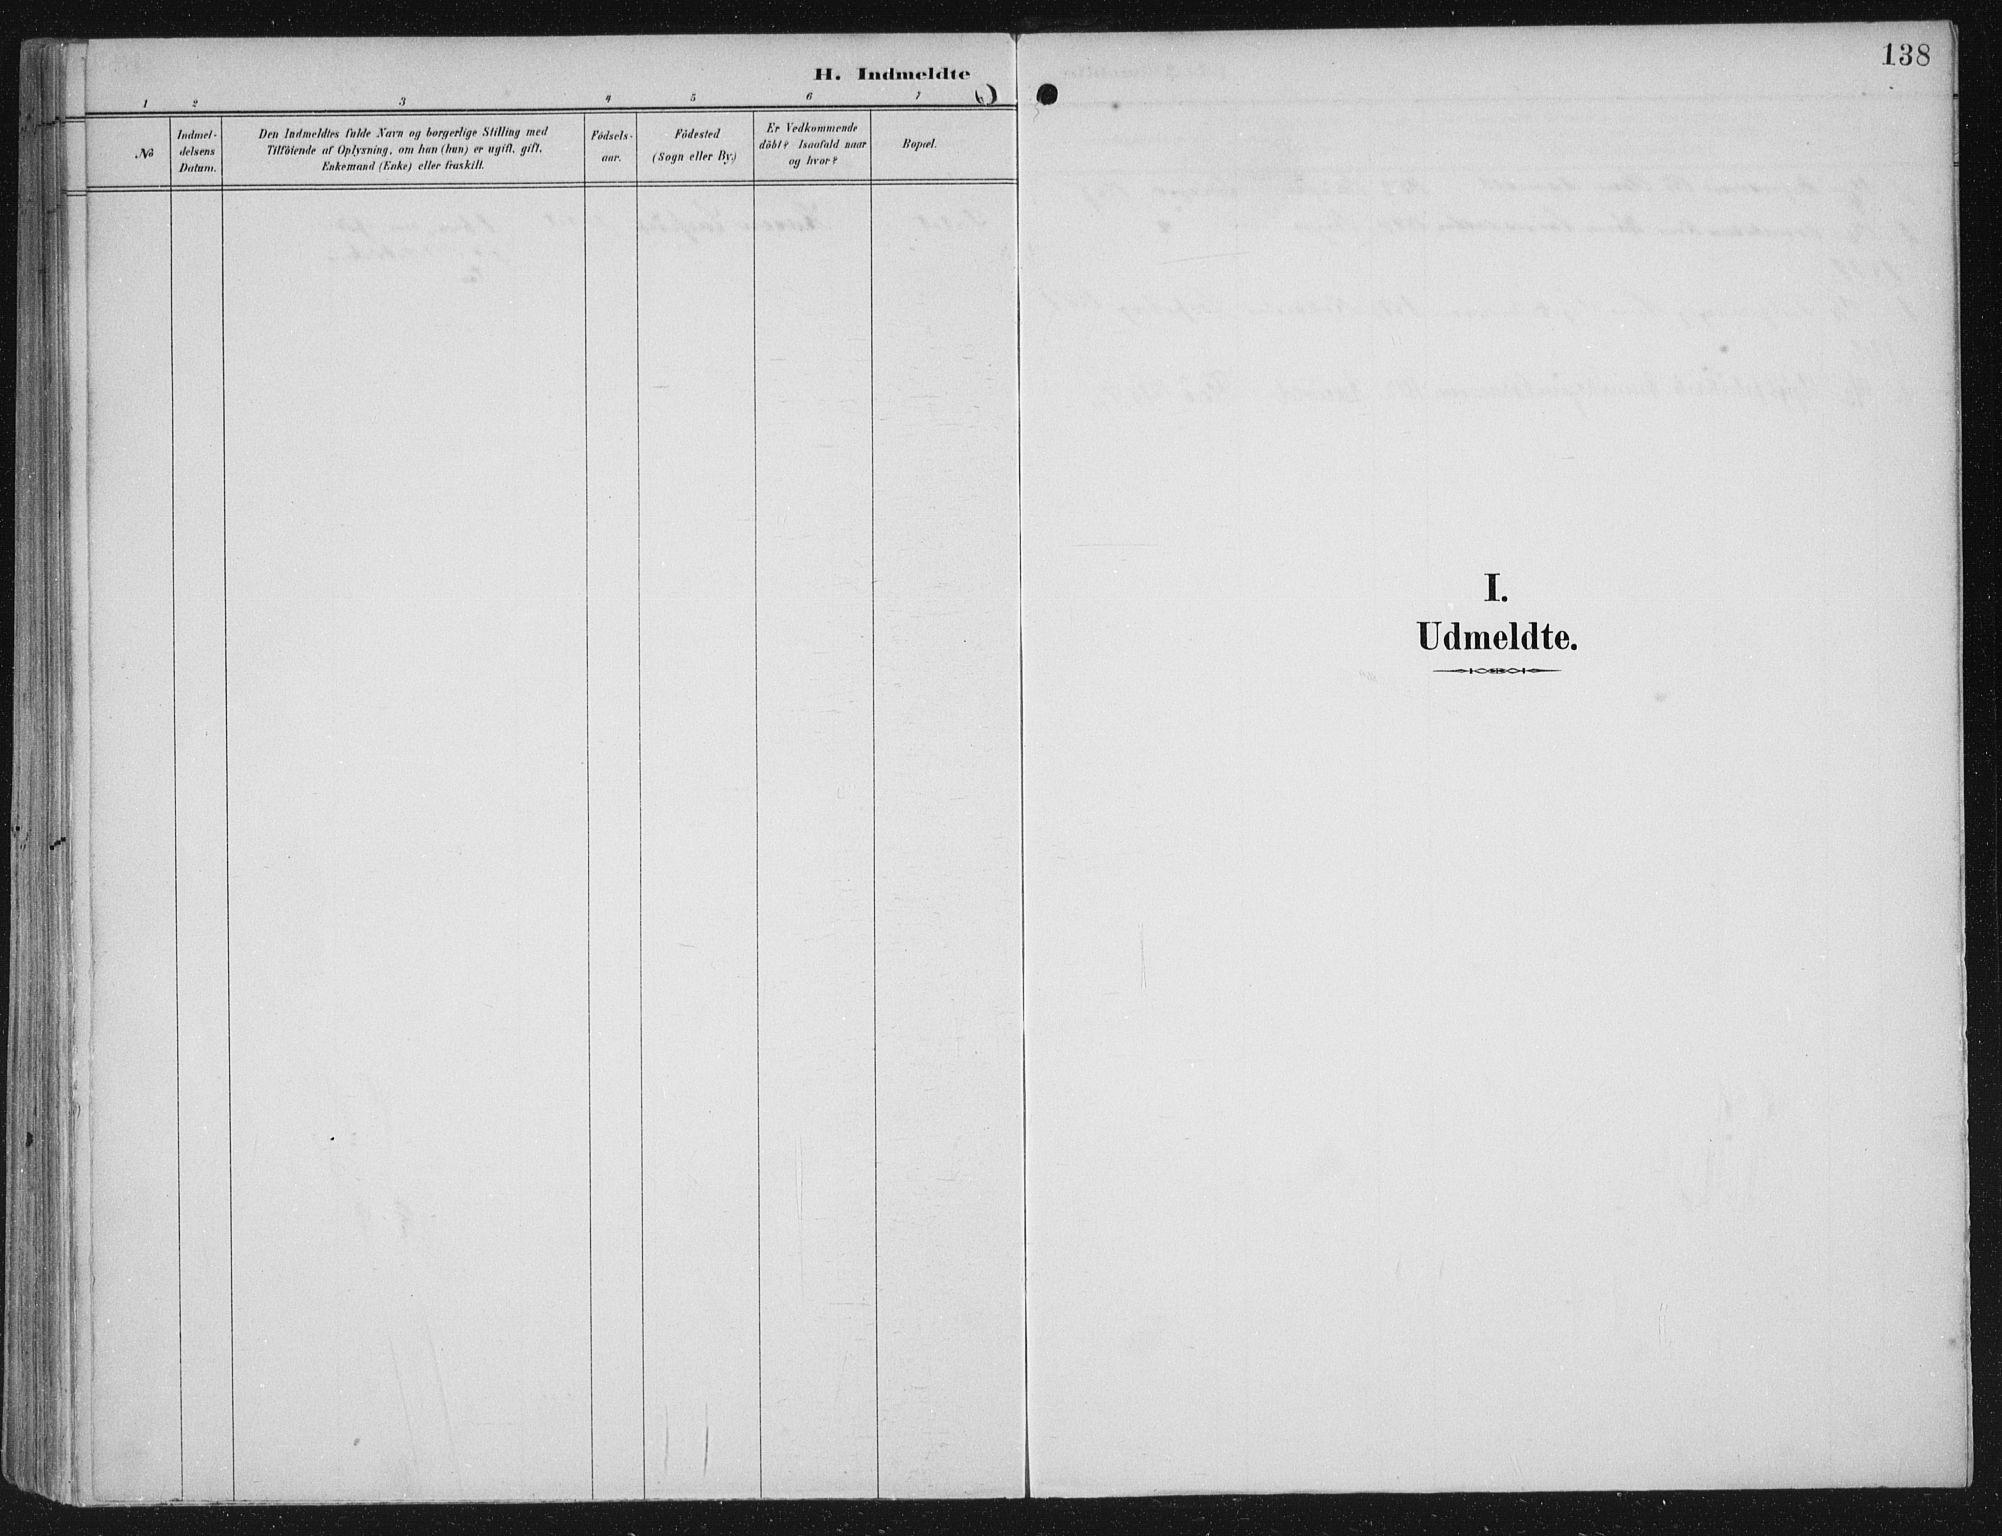 SAB, Kinn sokneprestembete, H/Haa/Haac/L0002: Ministerialbok nr. C  2, 1895-1916, s. 138